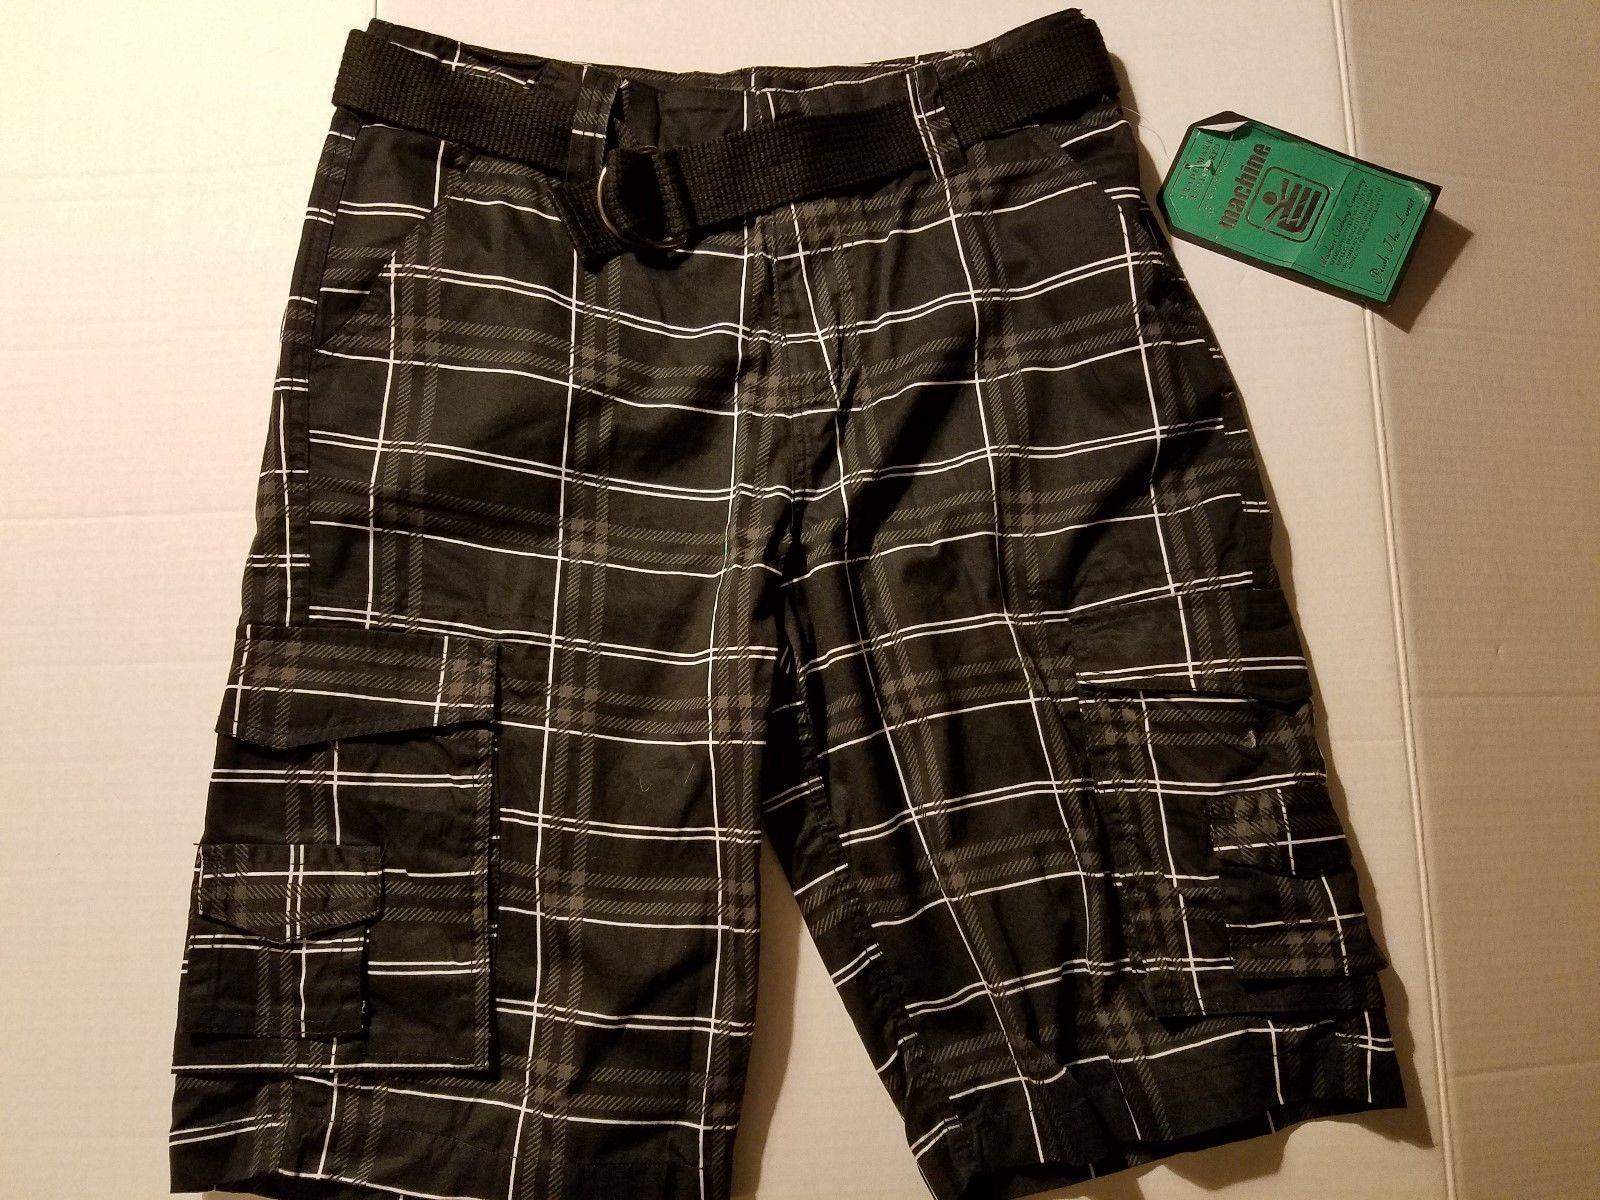 Machine Clothing Co.Boys Board Shorts Swim Shorts Trunks W Belt Size 16 18 NWT